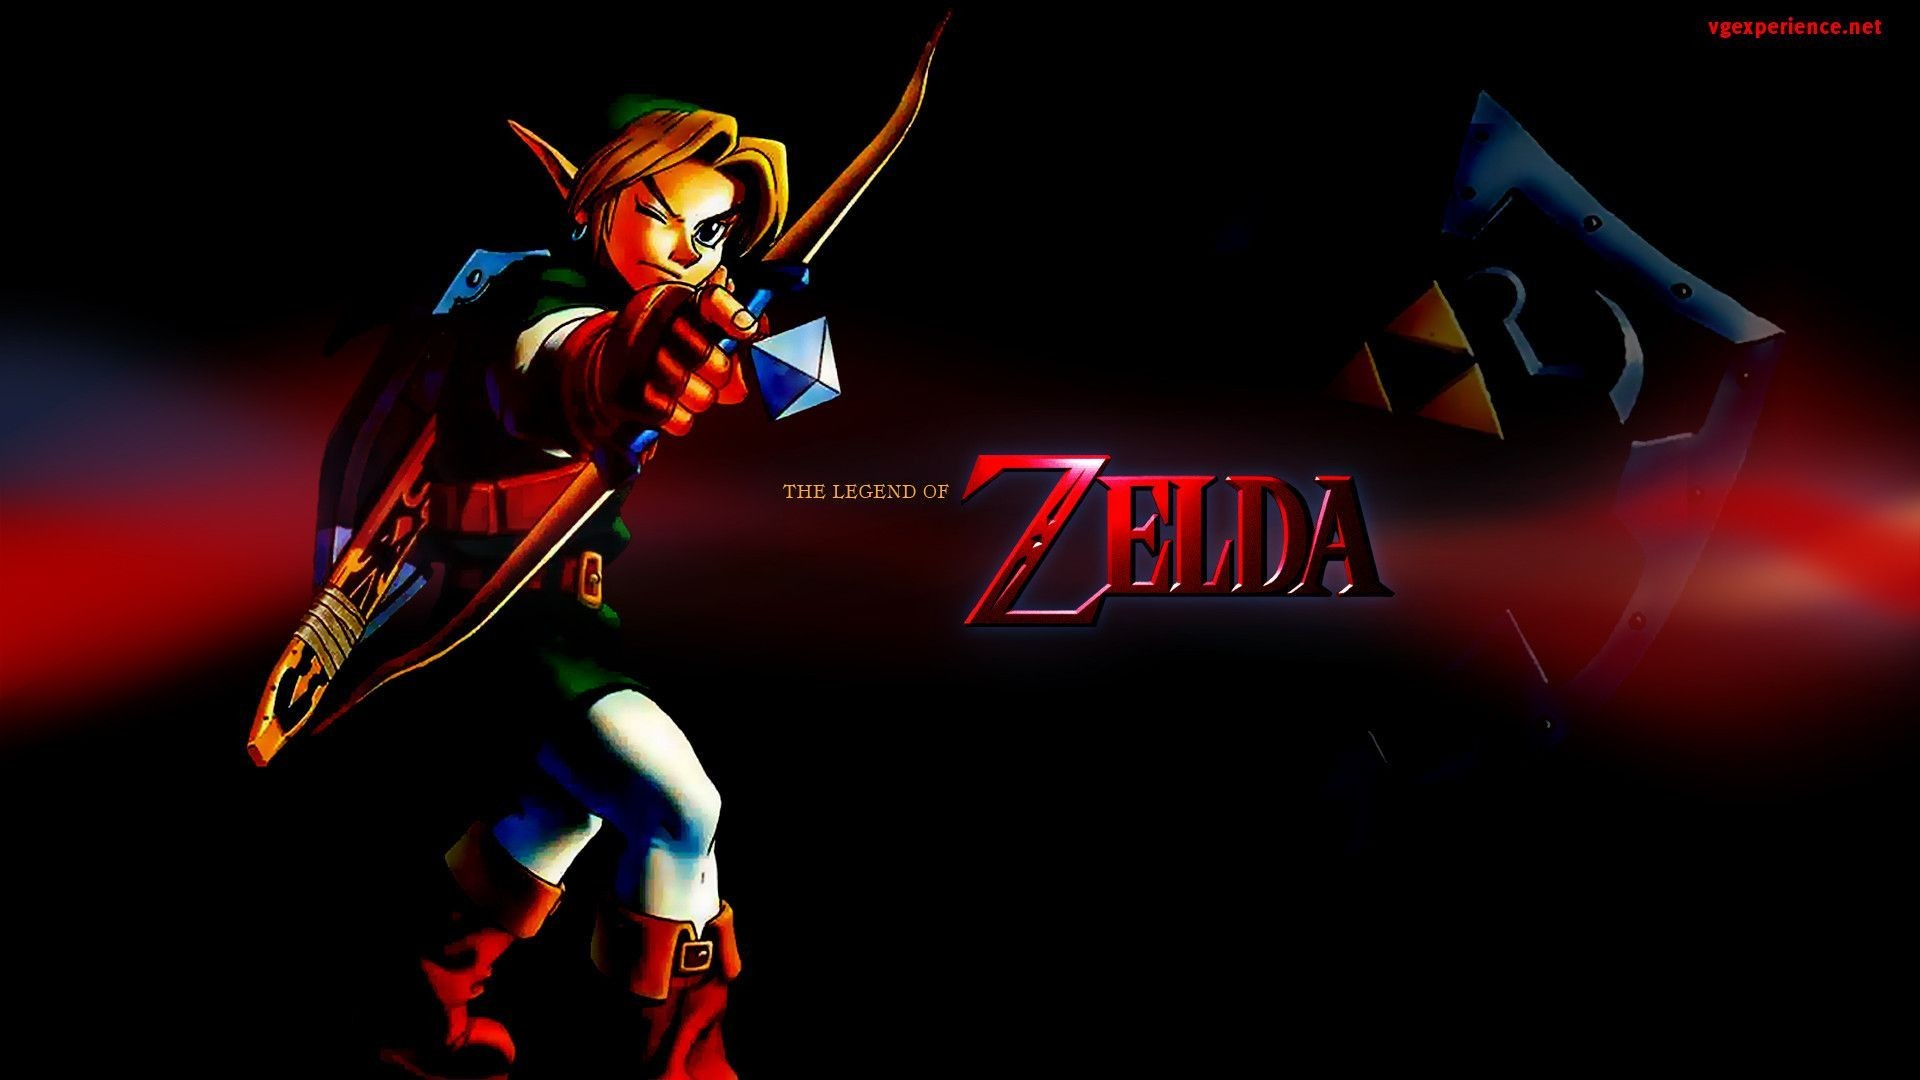 Legend Of Zelda Ocarina Of Time Wallpaper